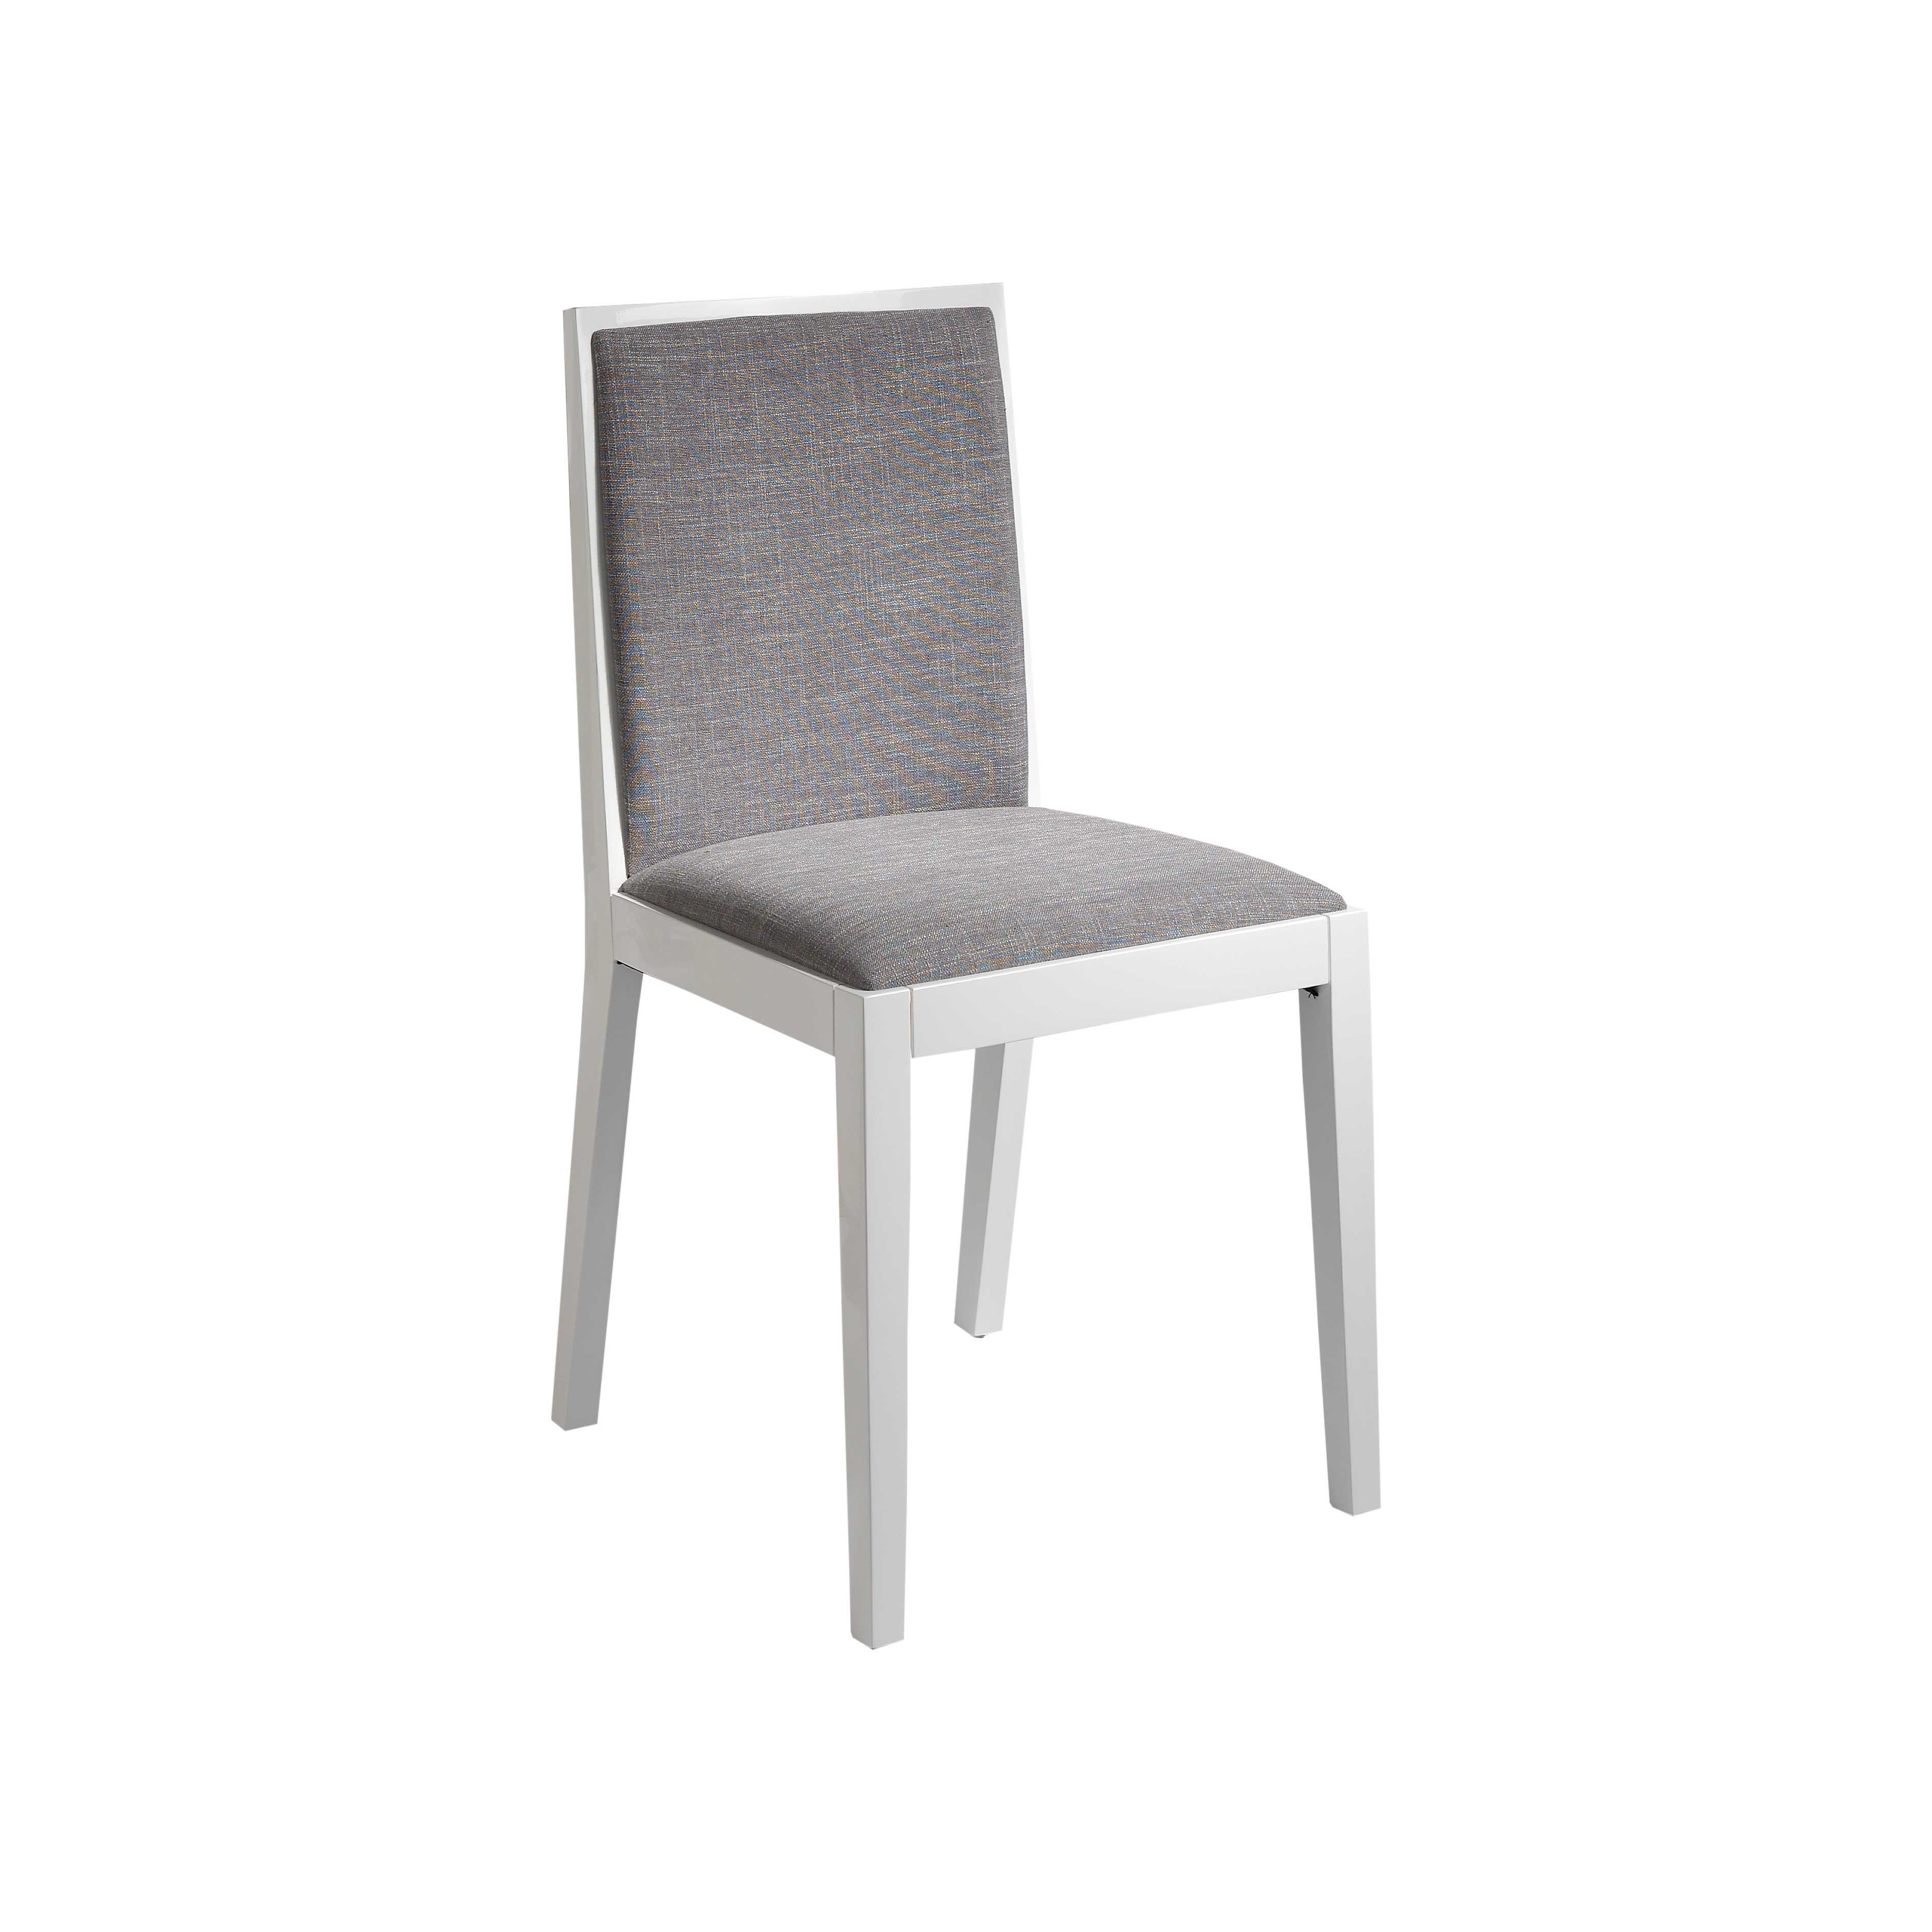 Pack 2 sillas de comedor color gris